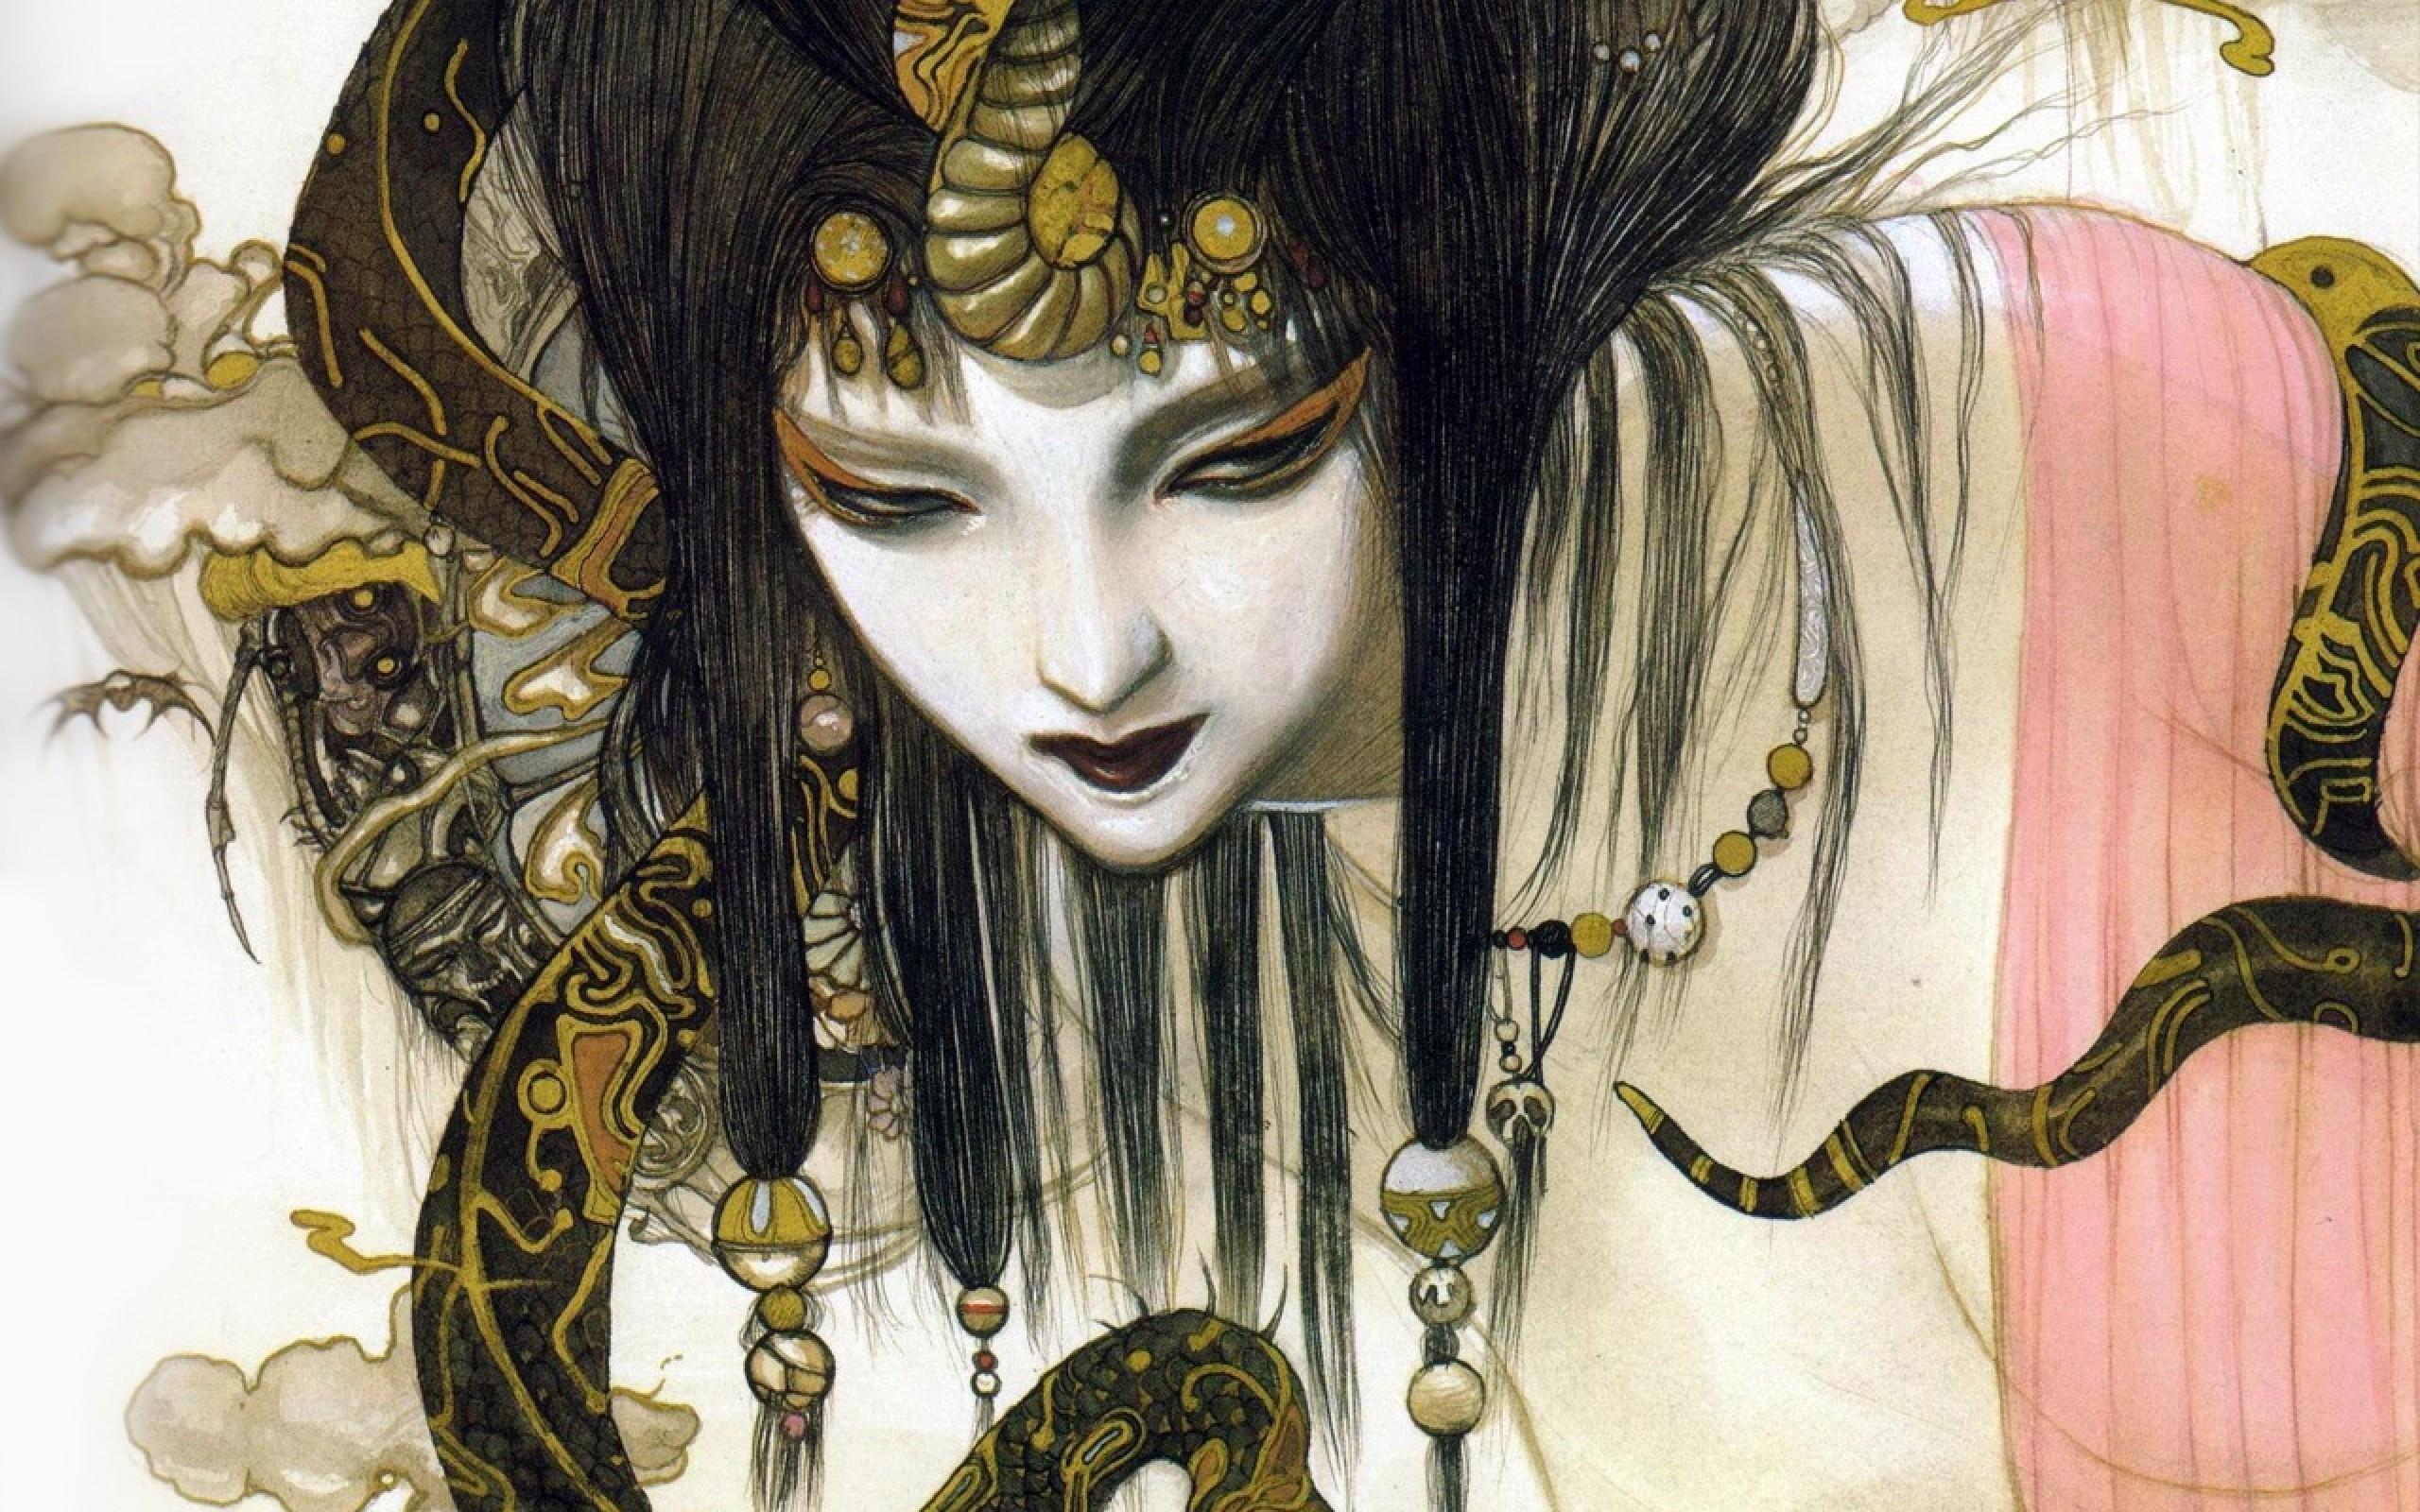 Res: 2560x1600, Art & Creative Wallpapers. Download the following Yoshitaka Amano ...